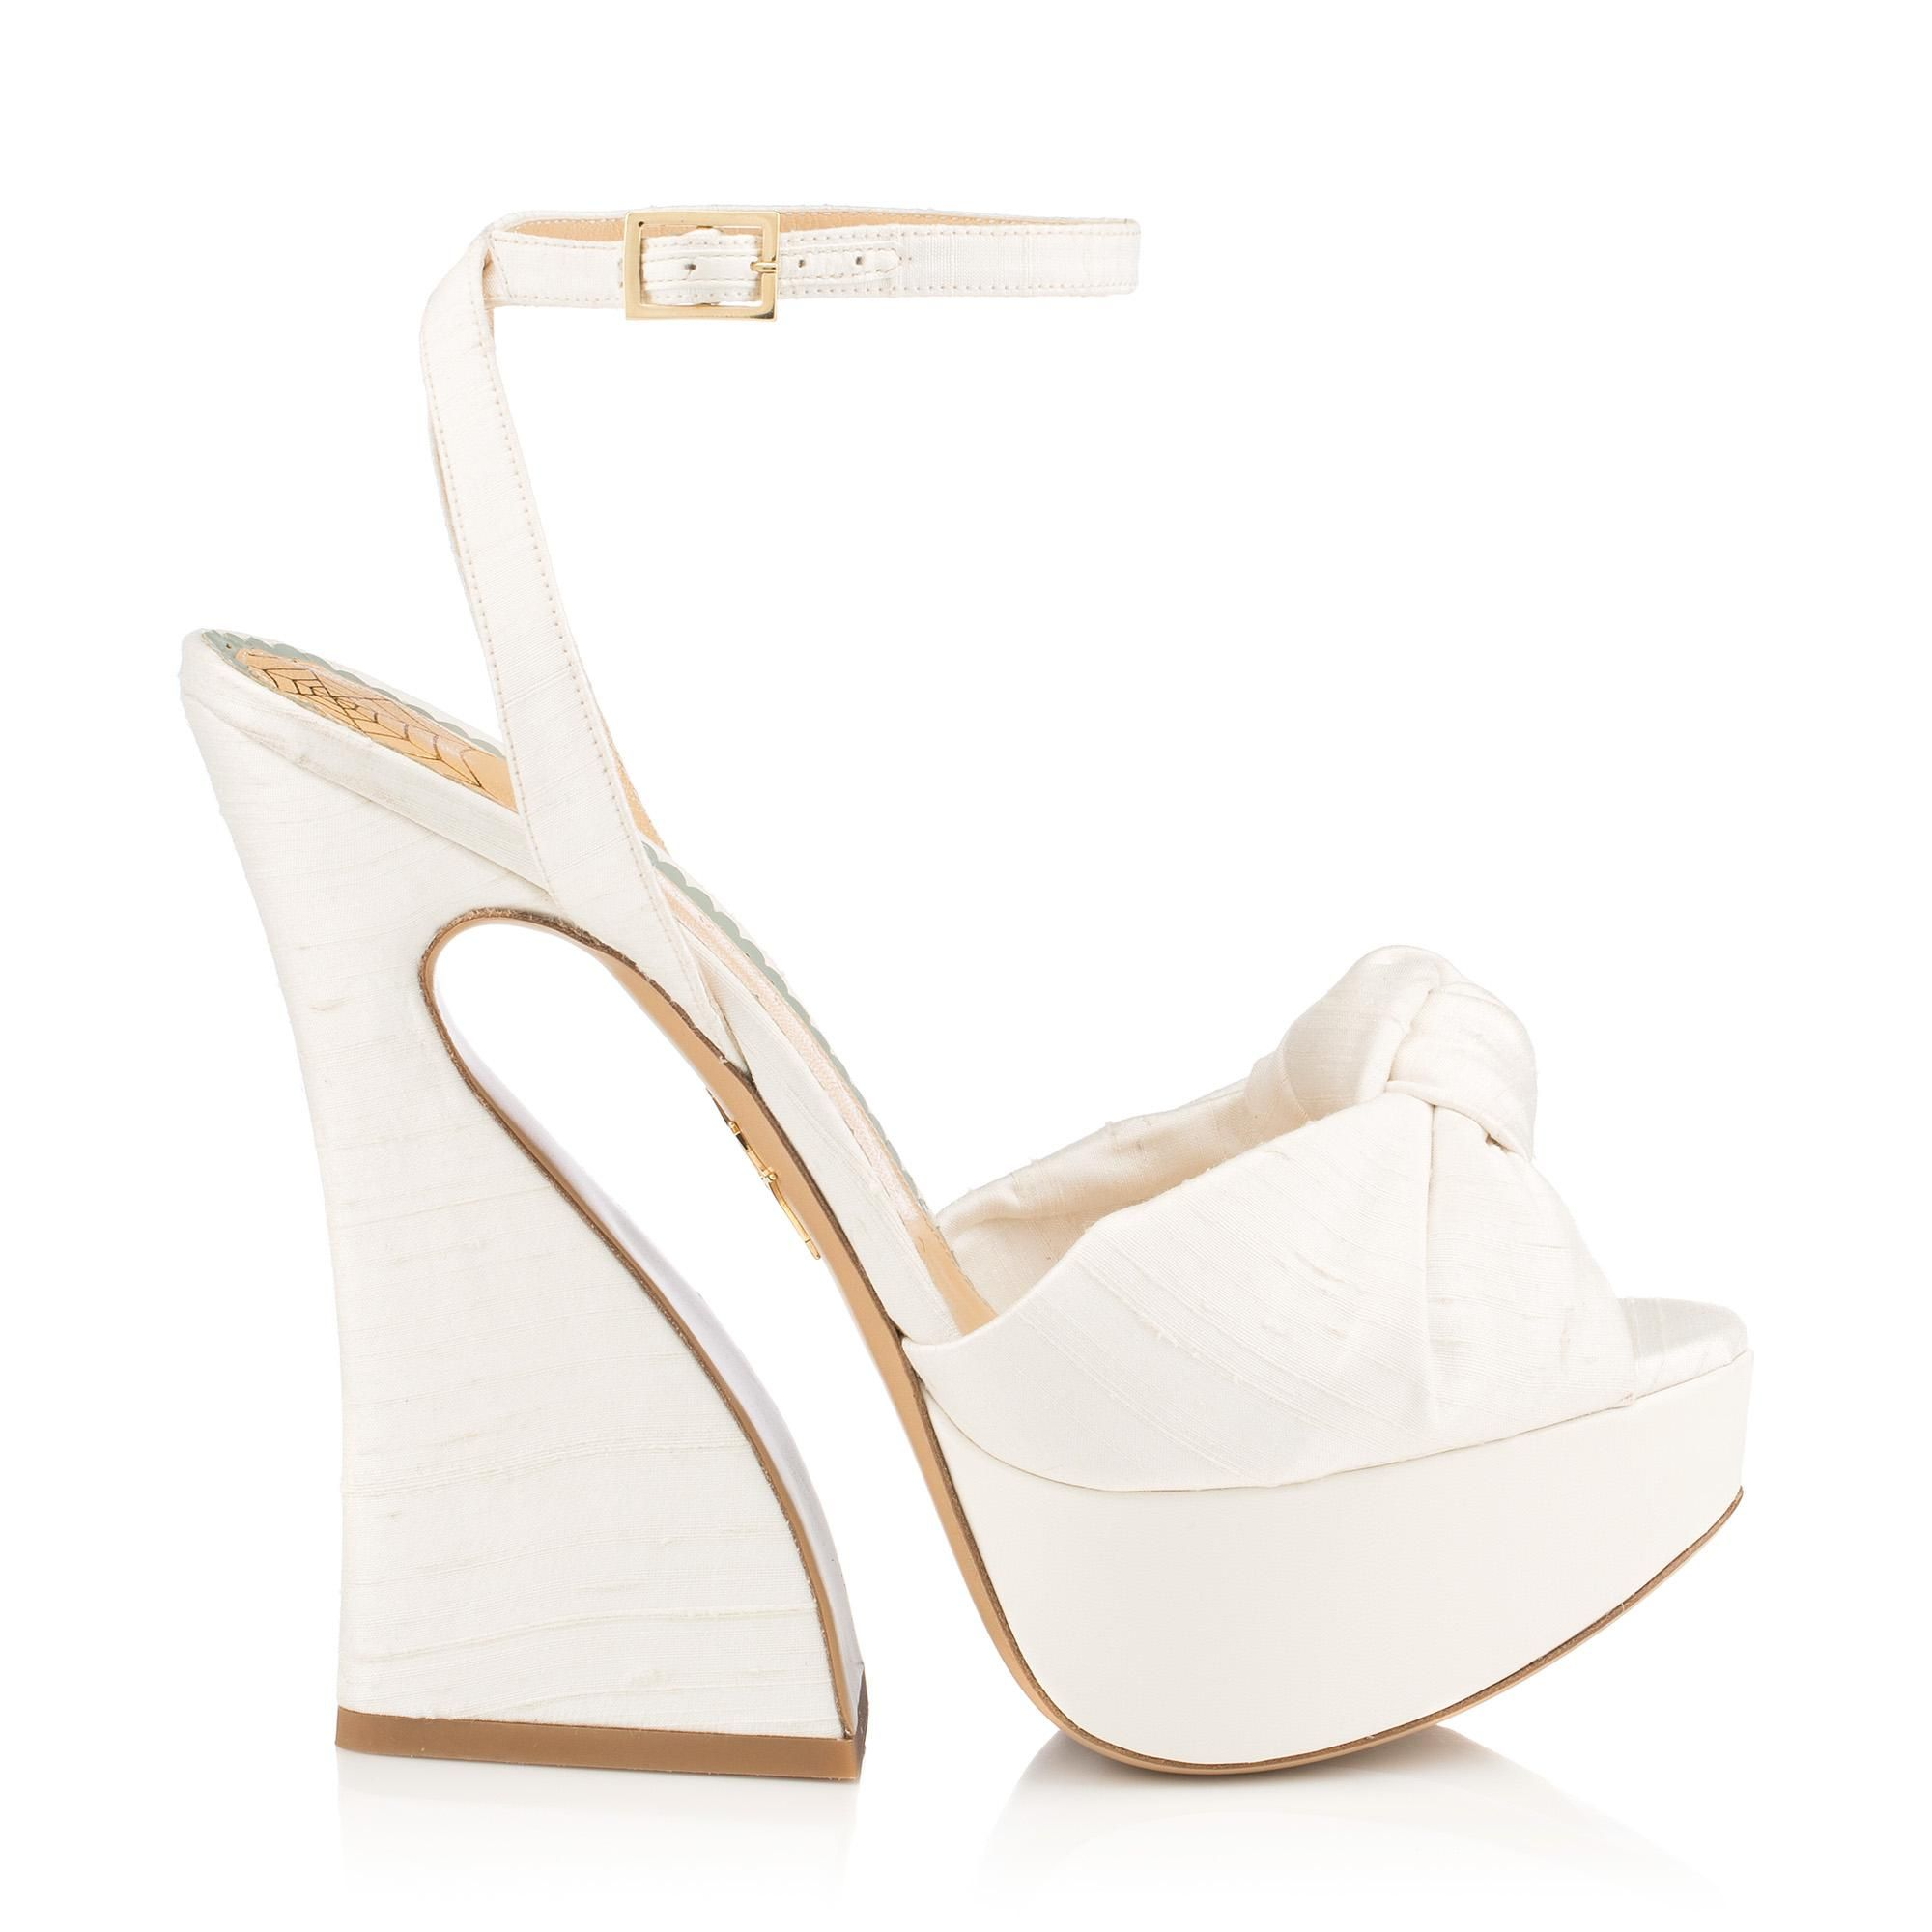 Charlotte Olympia Women's Designer Sandals | Charlotte Olympia - VREELAND.  Bridal ShoesWedding ...